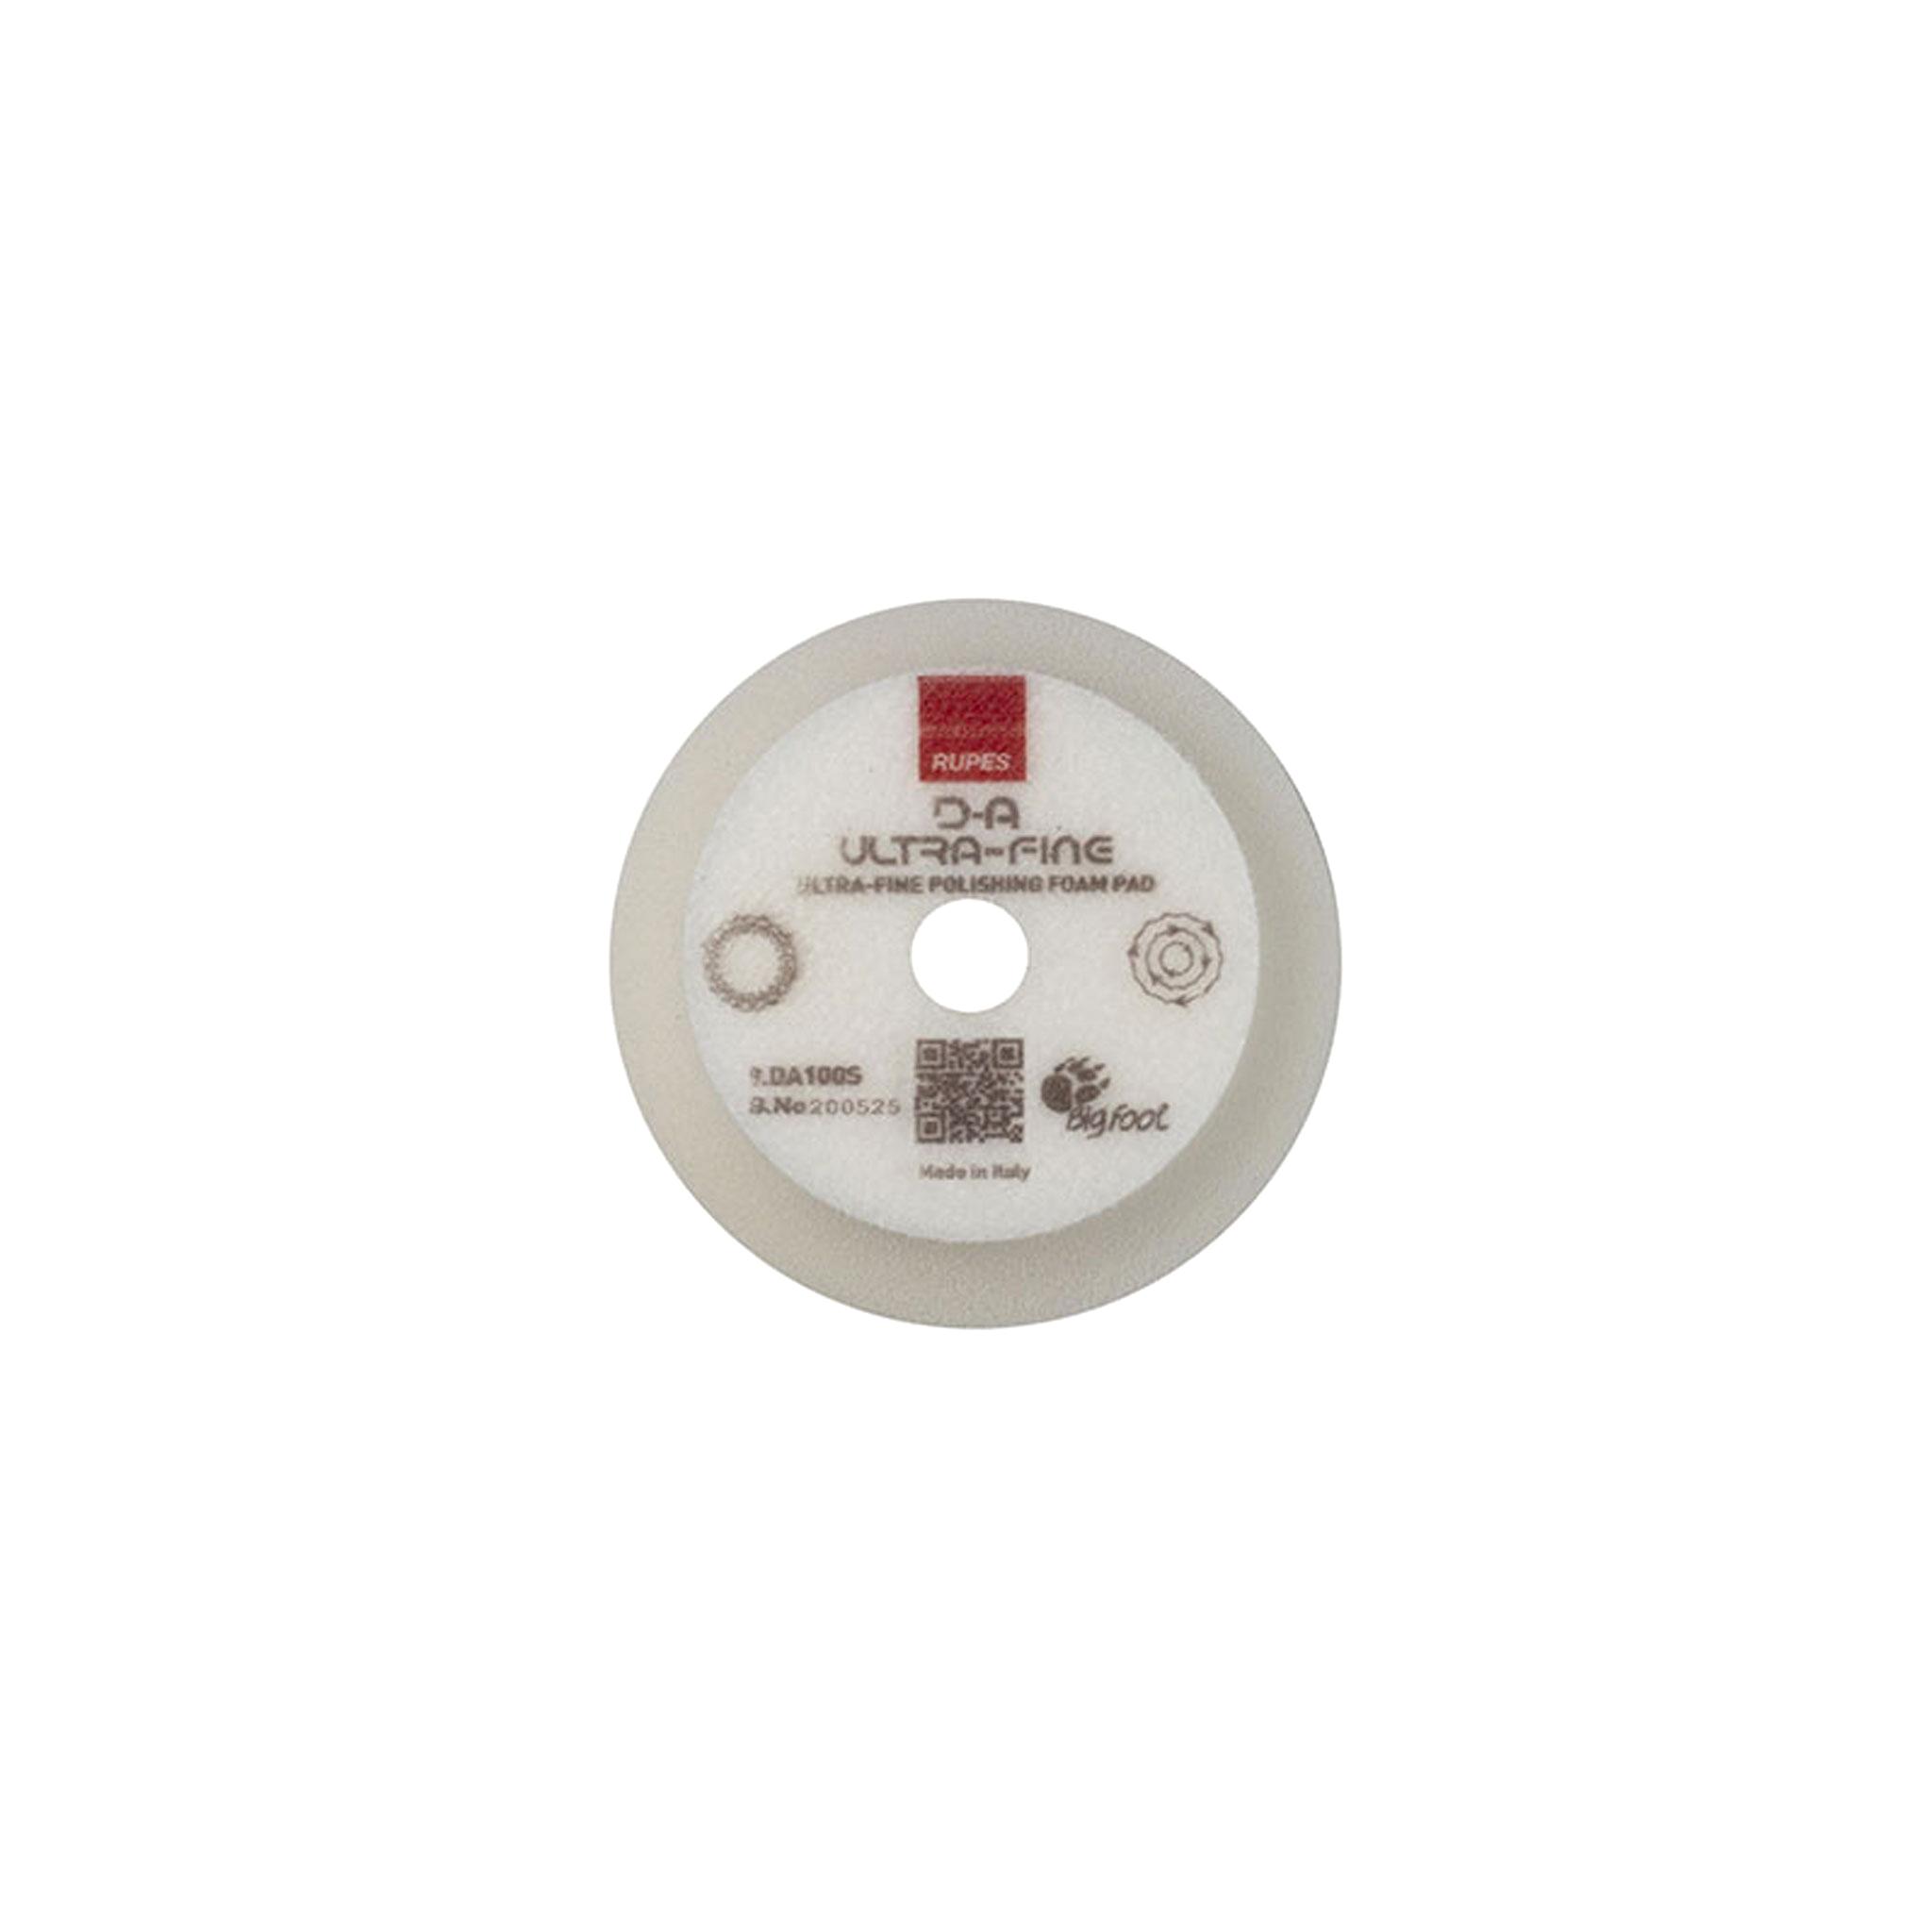 Skumrondell Rupes, D-A Ultrafine, Vit, 1st - 80/100 mm